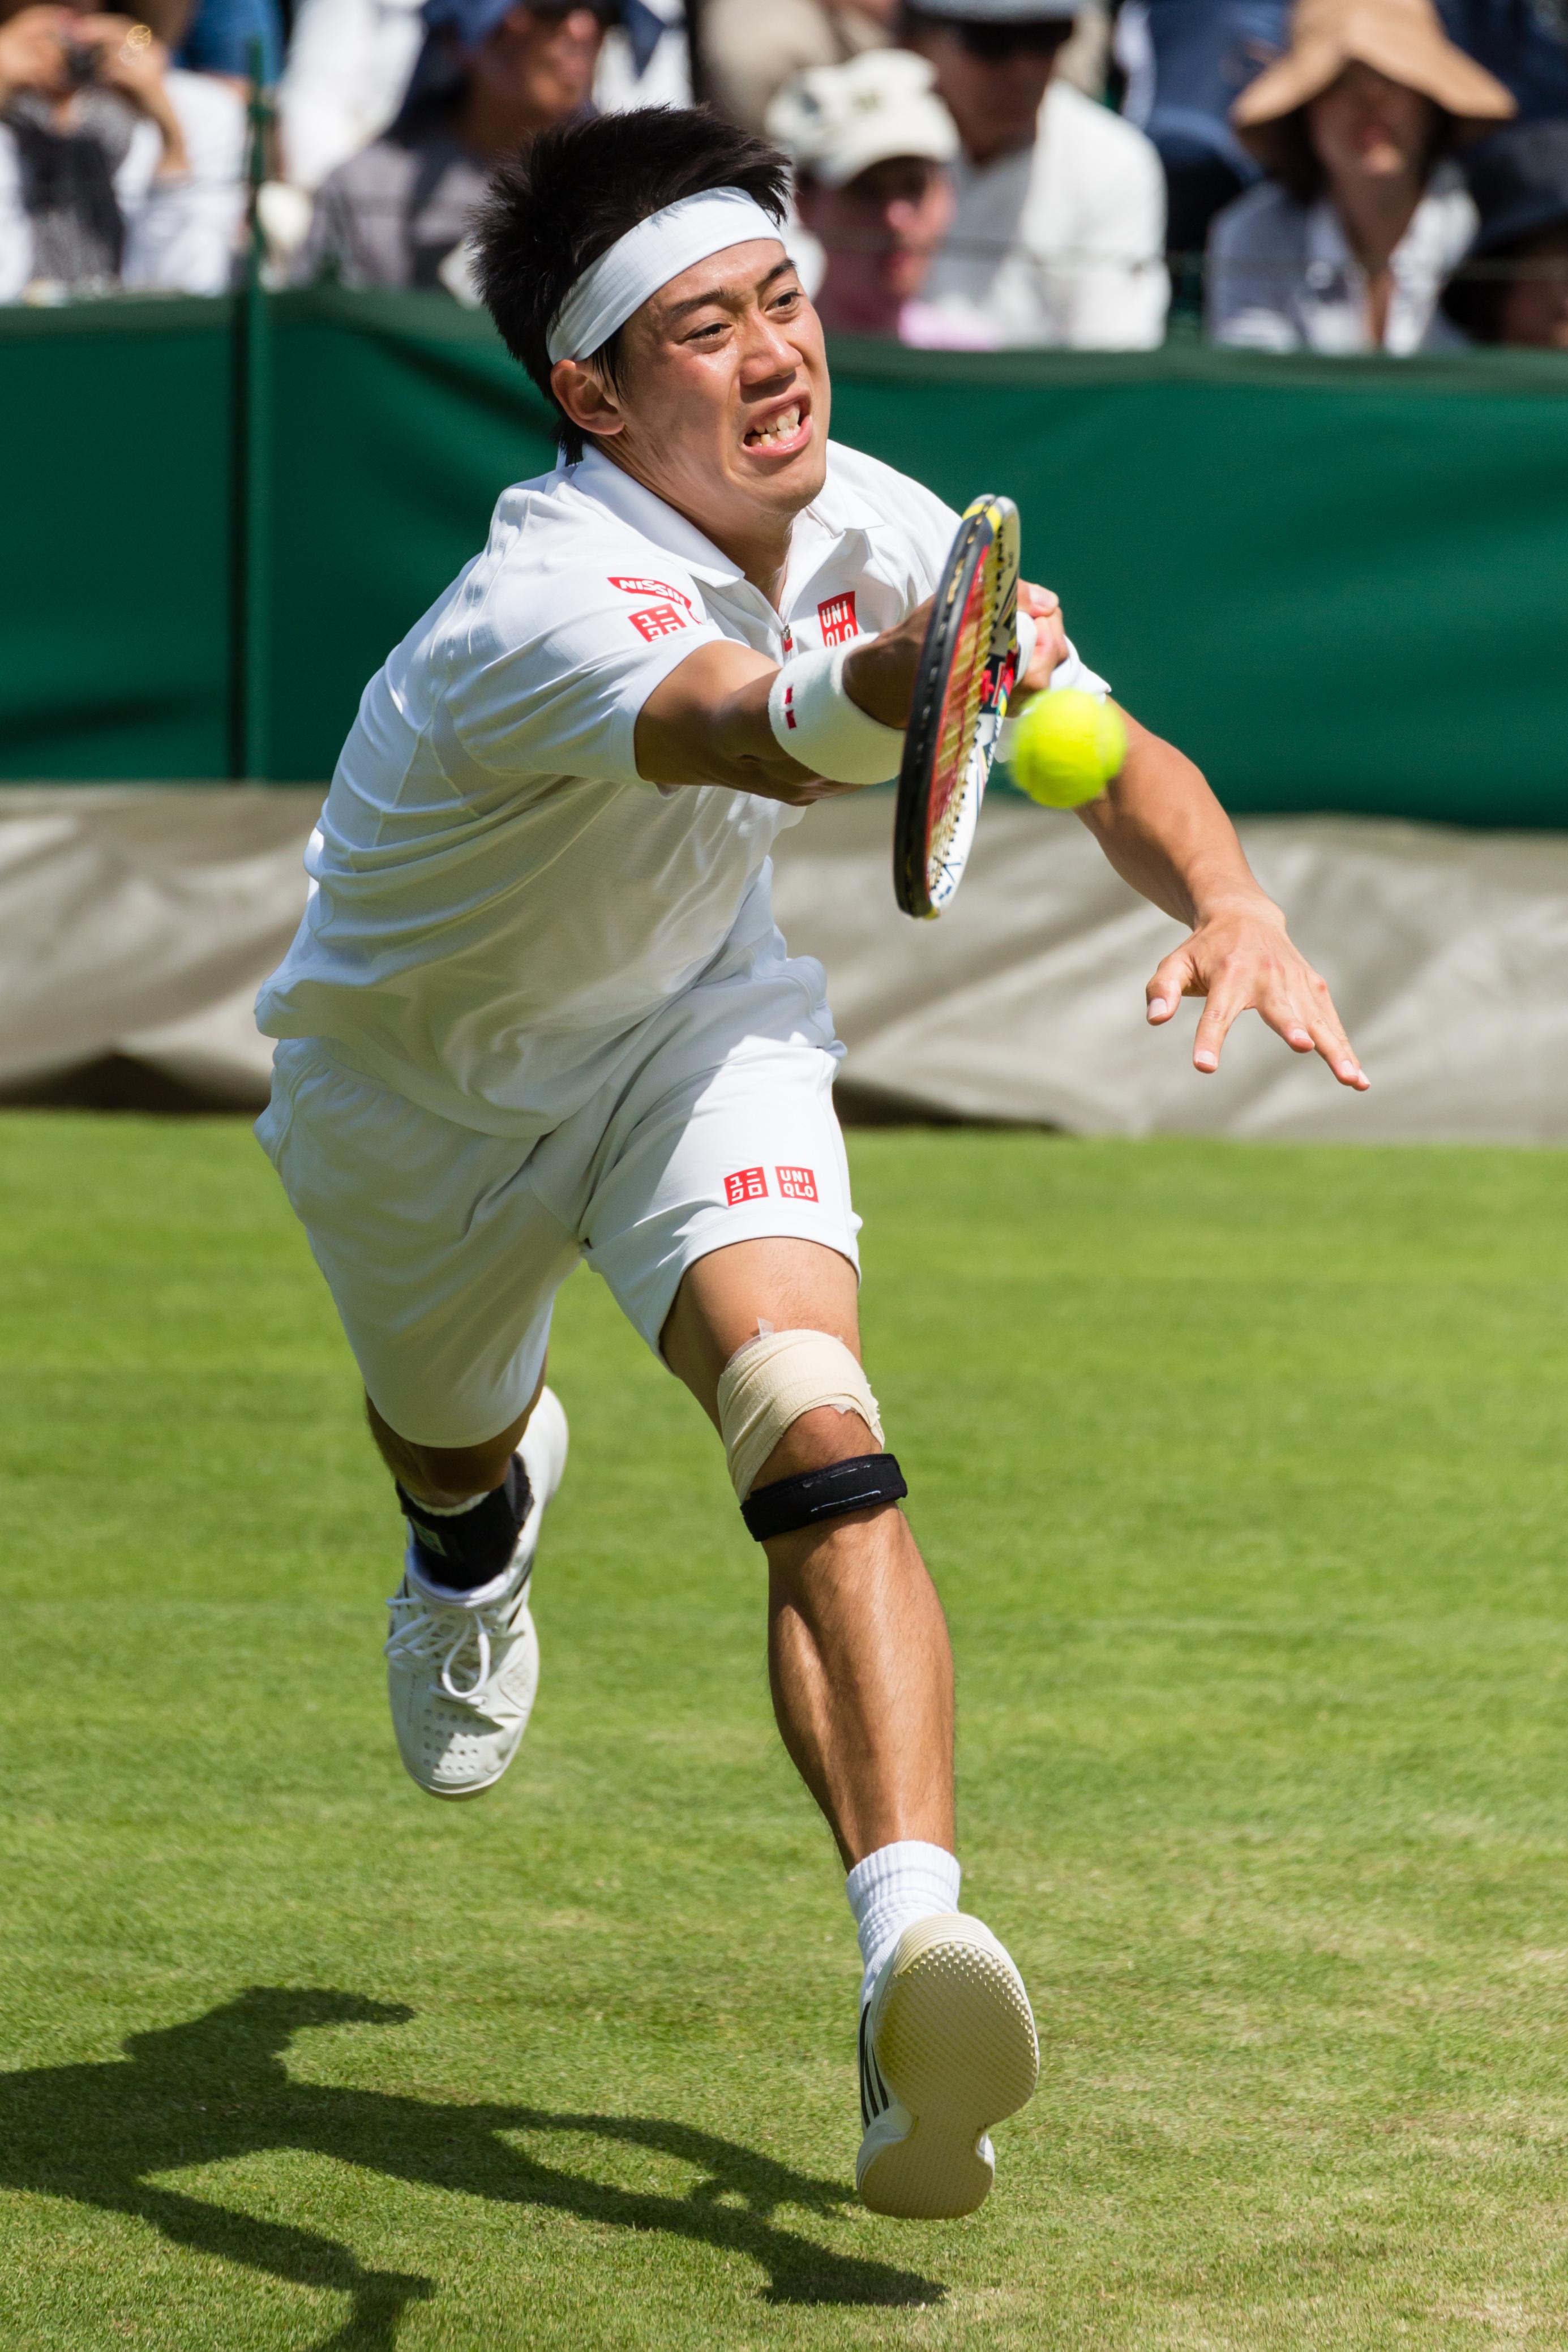 http://upload.wikimedia.org/wikipedia/commons/1/16/Kei_Nishikori_1,_Wimbledon_2013_-_Diliff.jpg